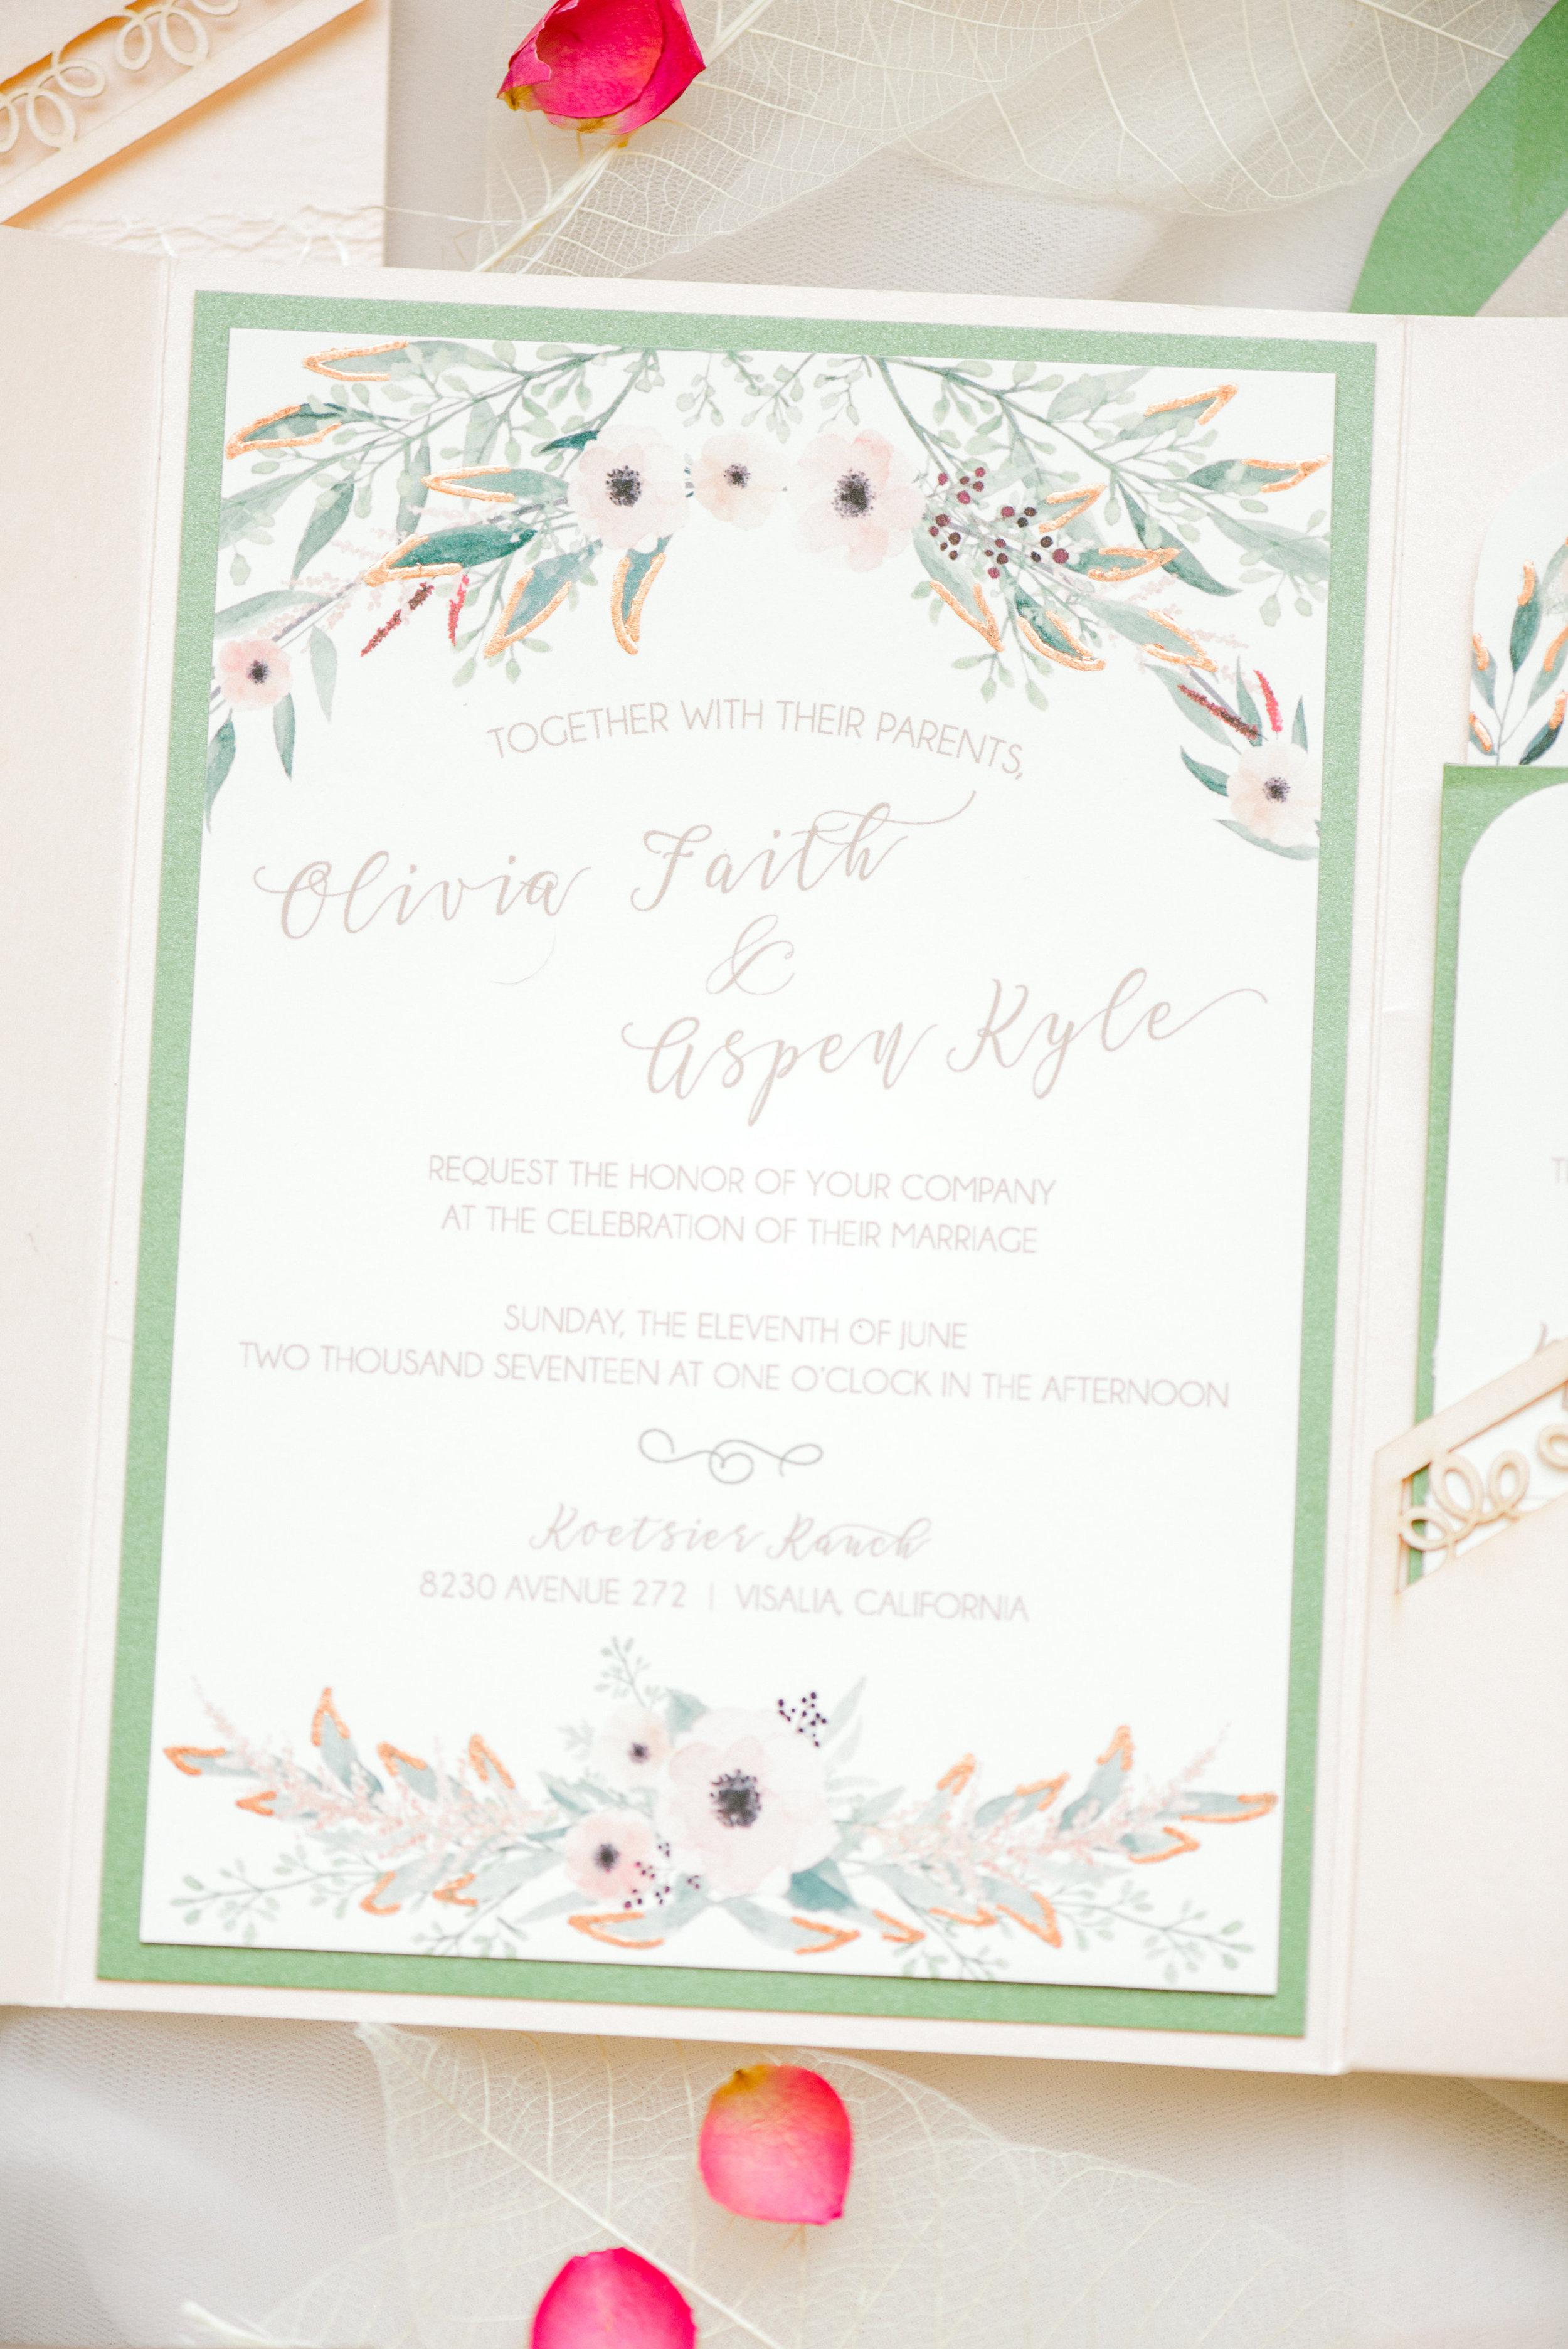 Peach Gold-Central PA, York PA, JesSmith Designs, custom, wedding, invitations, bridal, announcements, save the date, baby, hanover, calligraphy, baltimore, wedding invitations, lancaster, gettysburg68.jpg